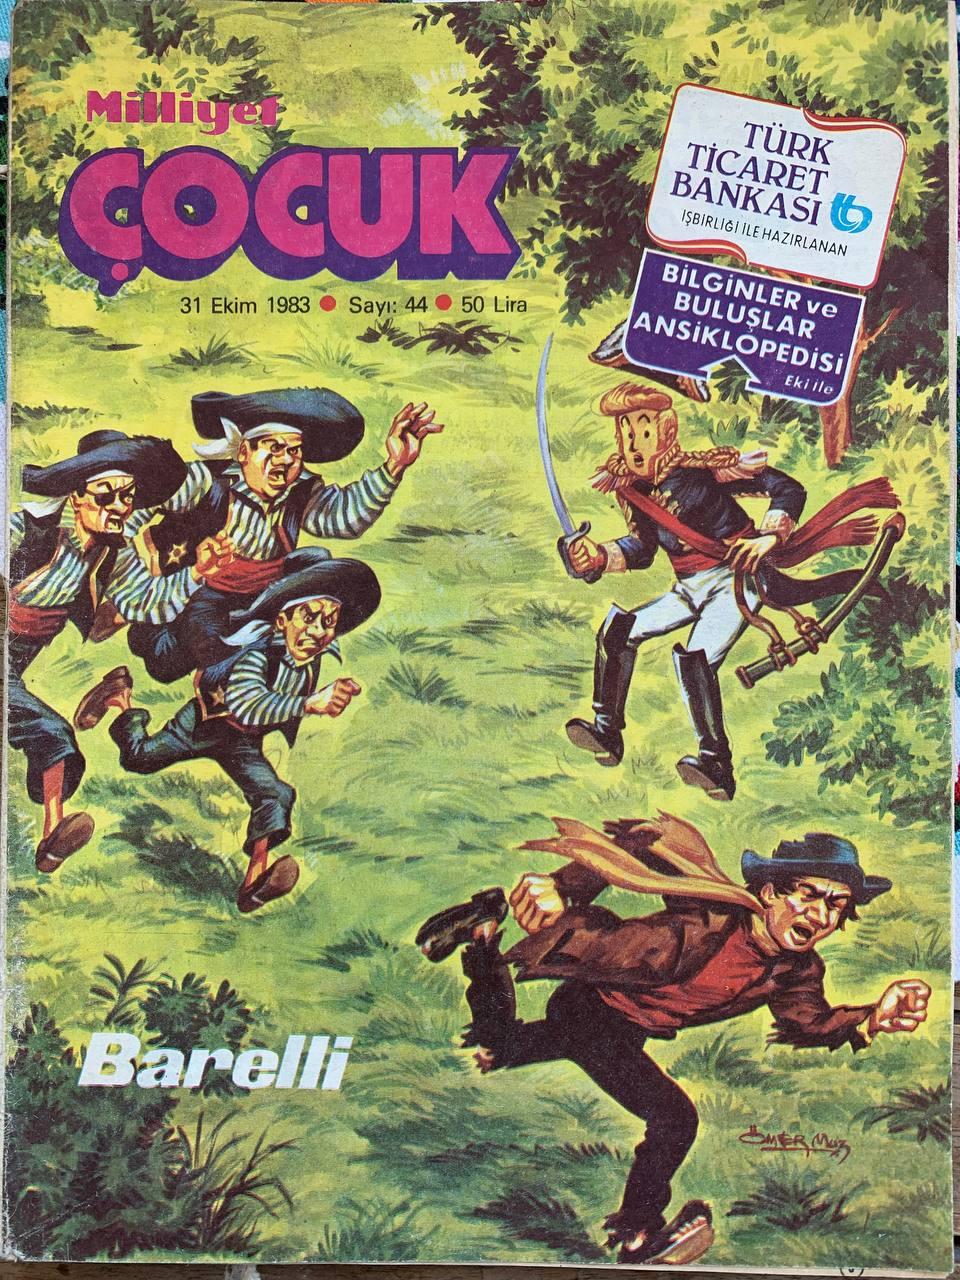 Bob De Moor's Barelli interpreted by Omer Muz for Milliyet Çocuk pblication